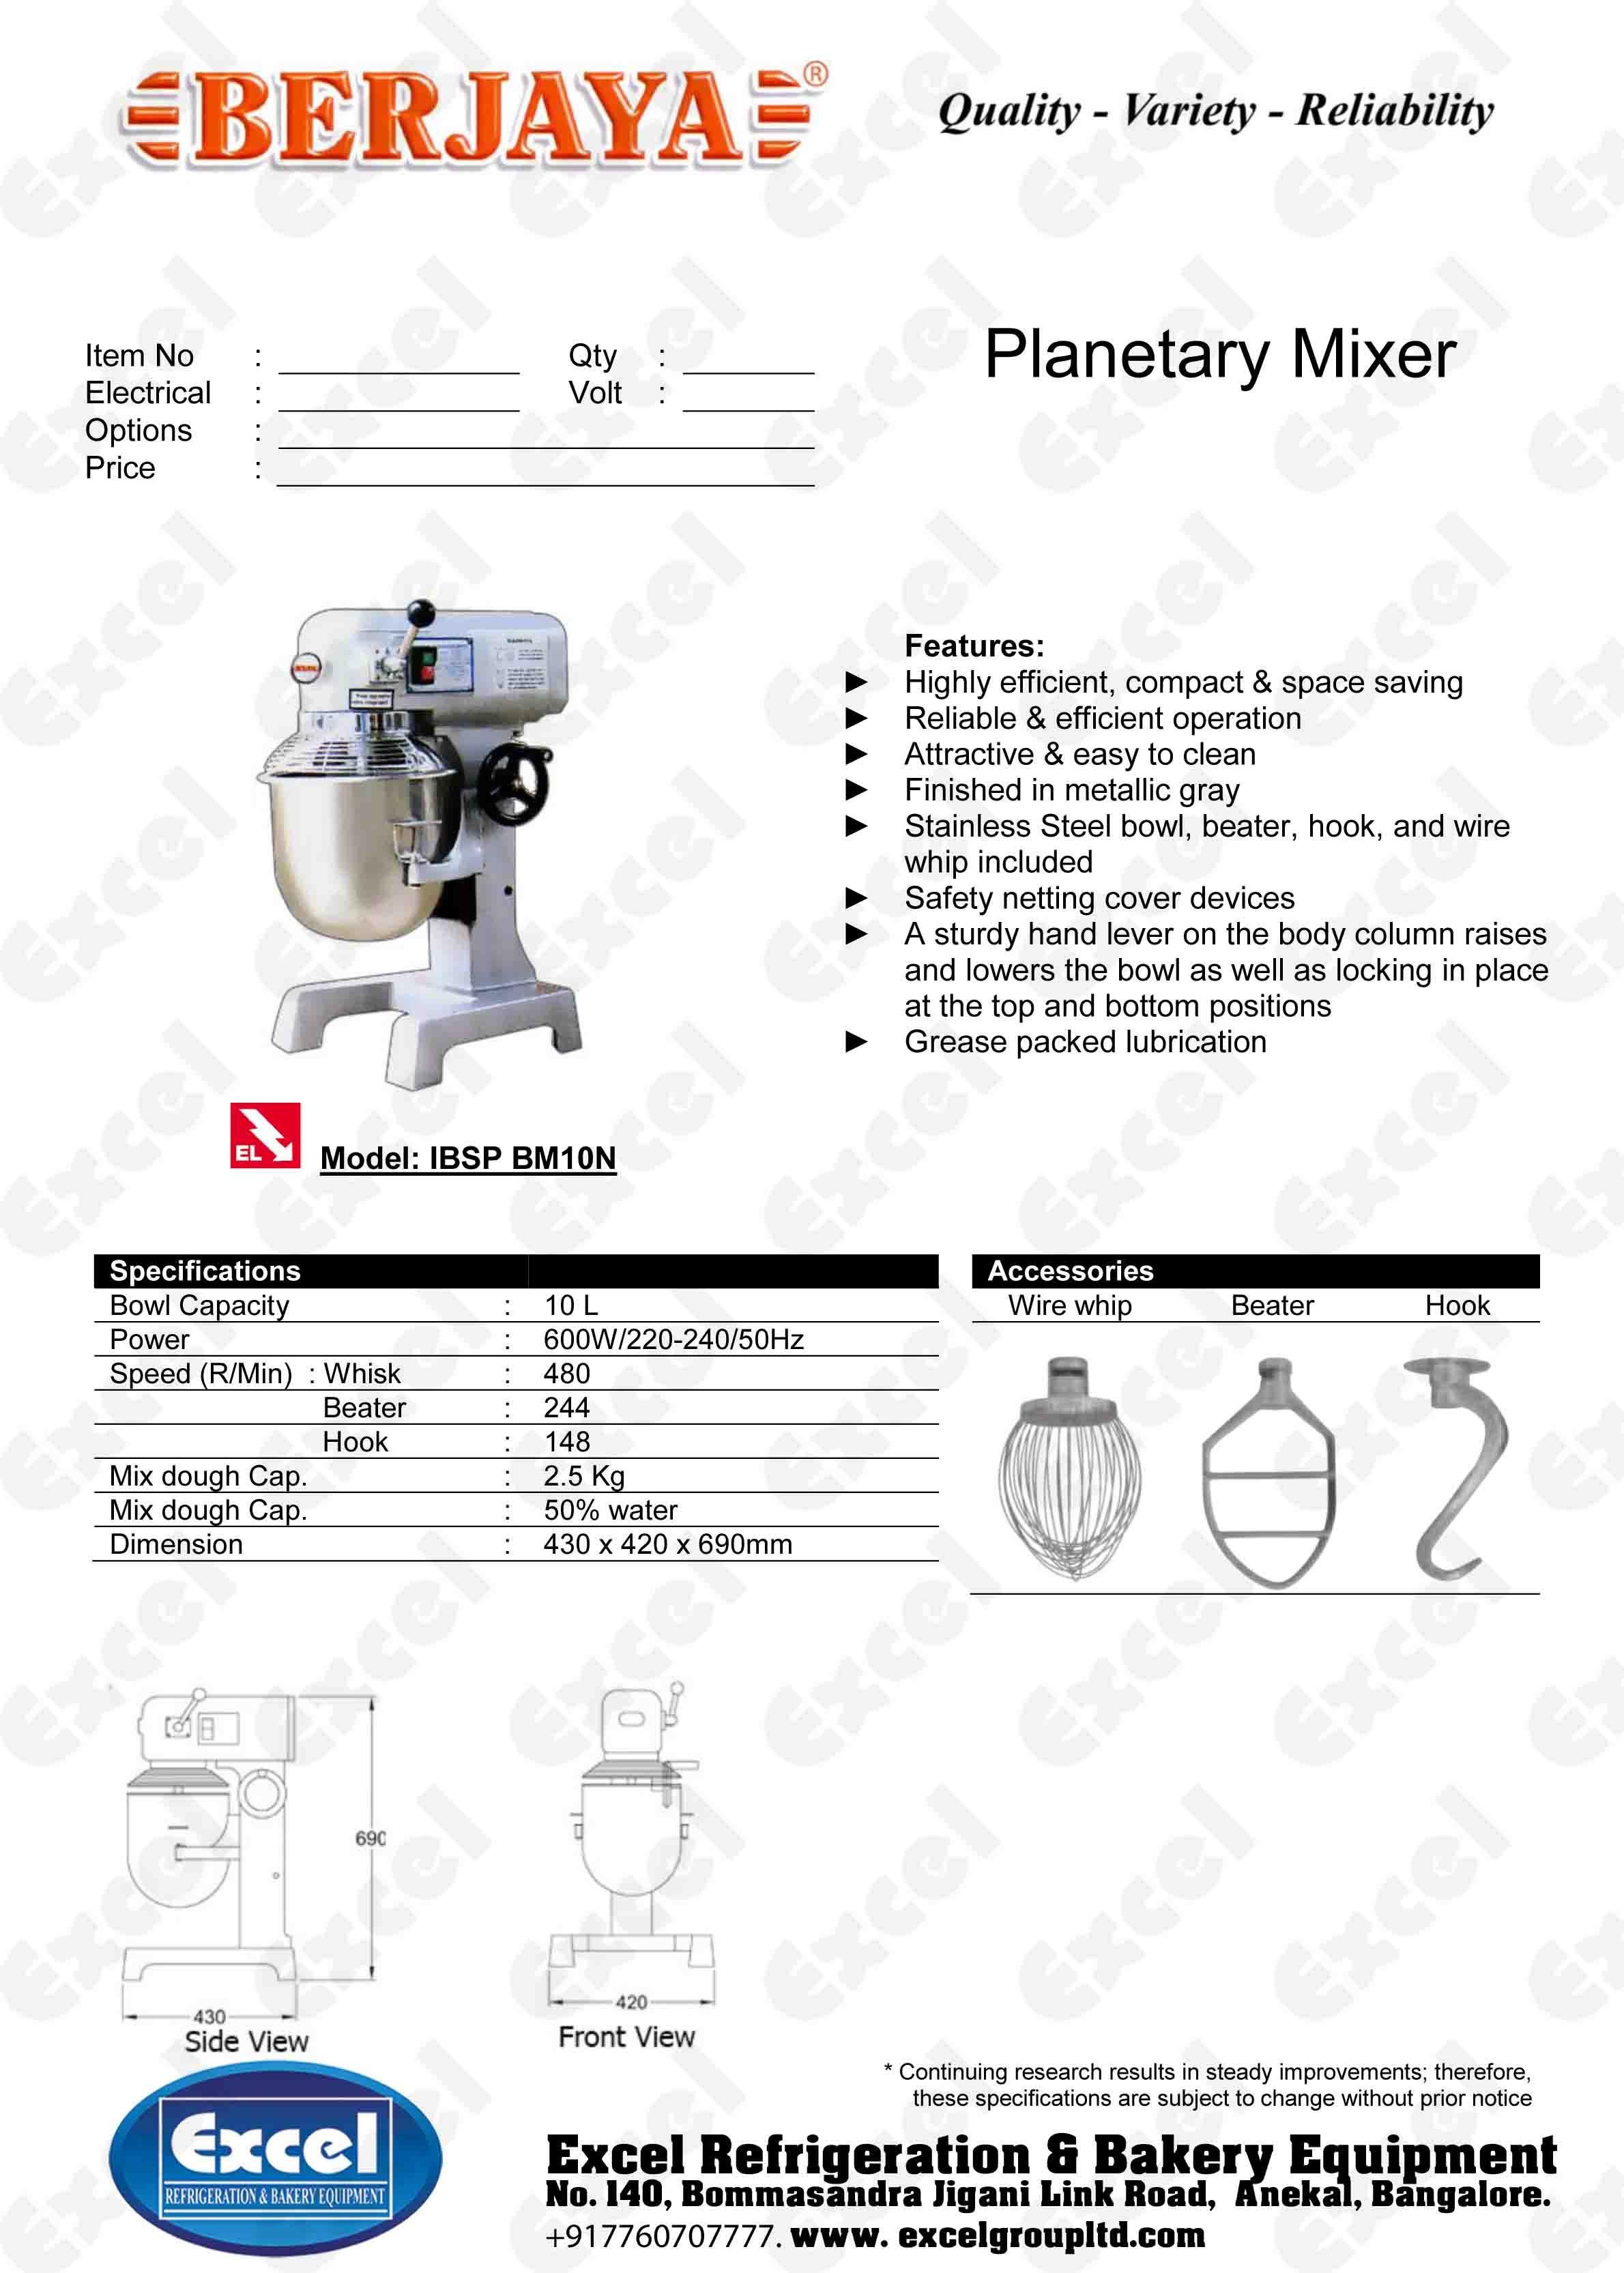 Berjaya Planetary Mixer Bm10n Excel Refrigeration Bakery Dough Wiring Diagram